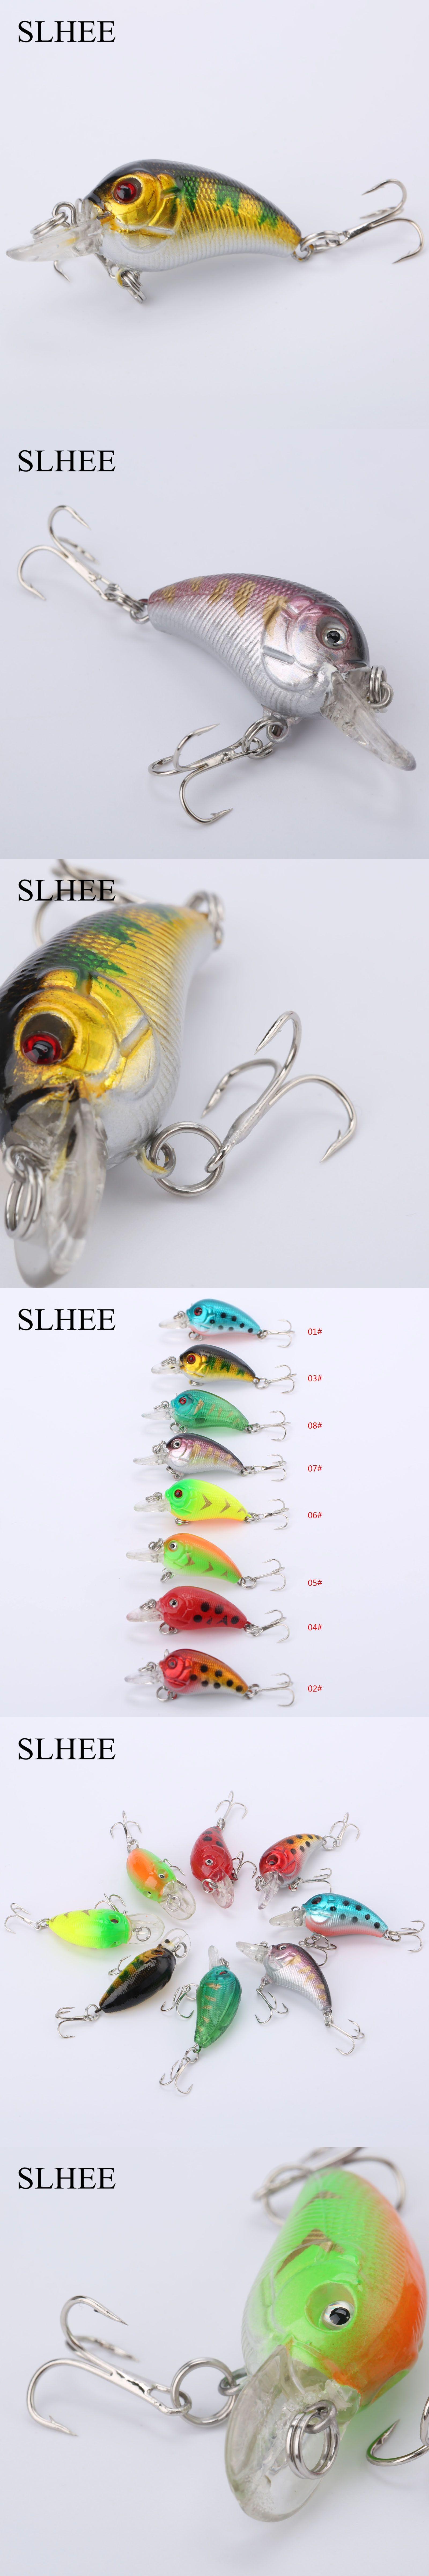 Slhee 1pc 45cm 42g Fishing Lure Baits Artificial Hard Crank Bait Spoon Spinner Metal 10 Pcs Plus Box Topwater Wobbler Mini